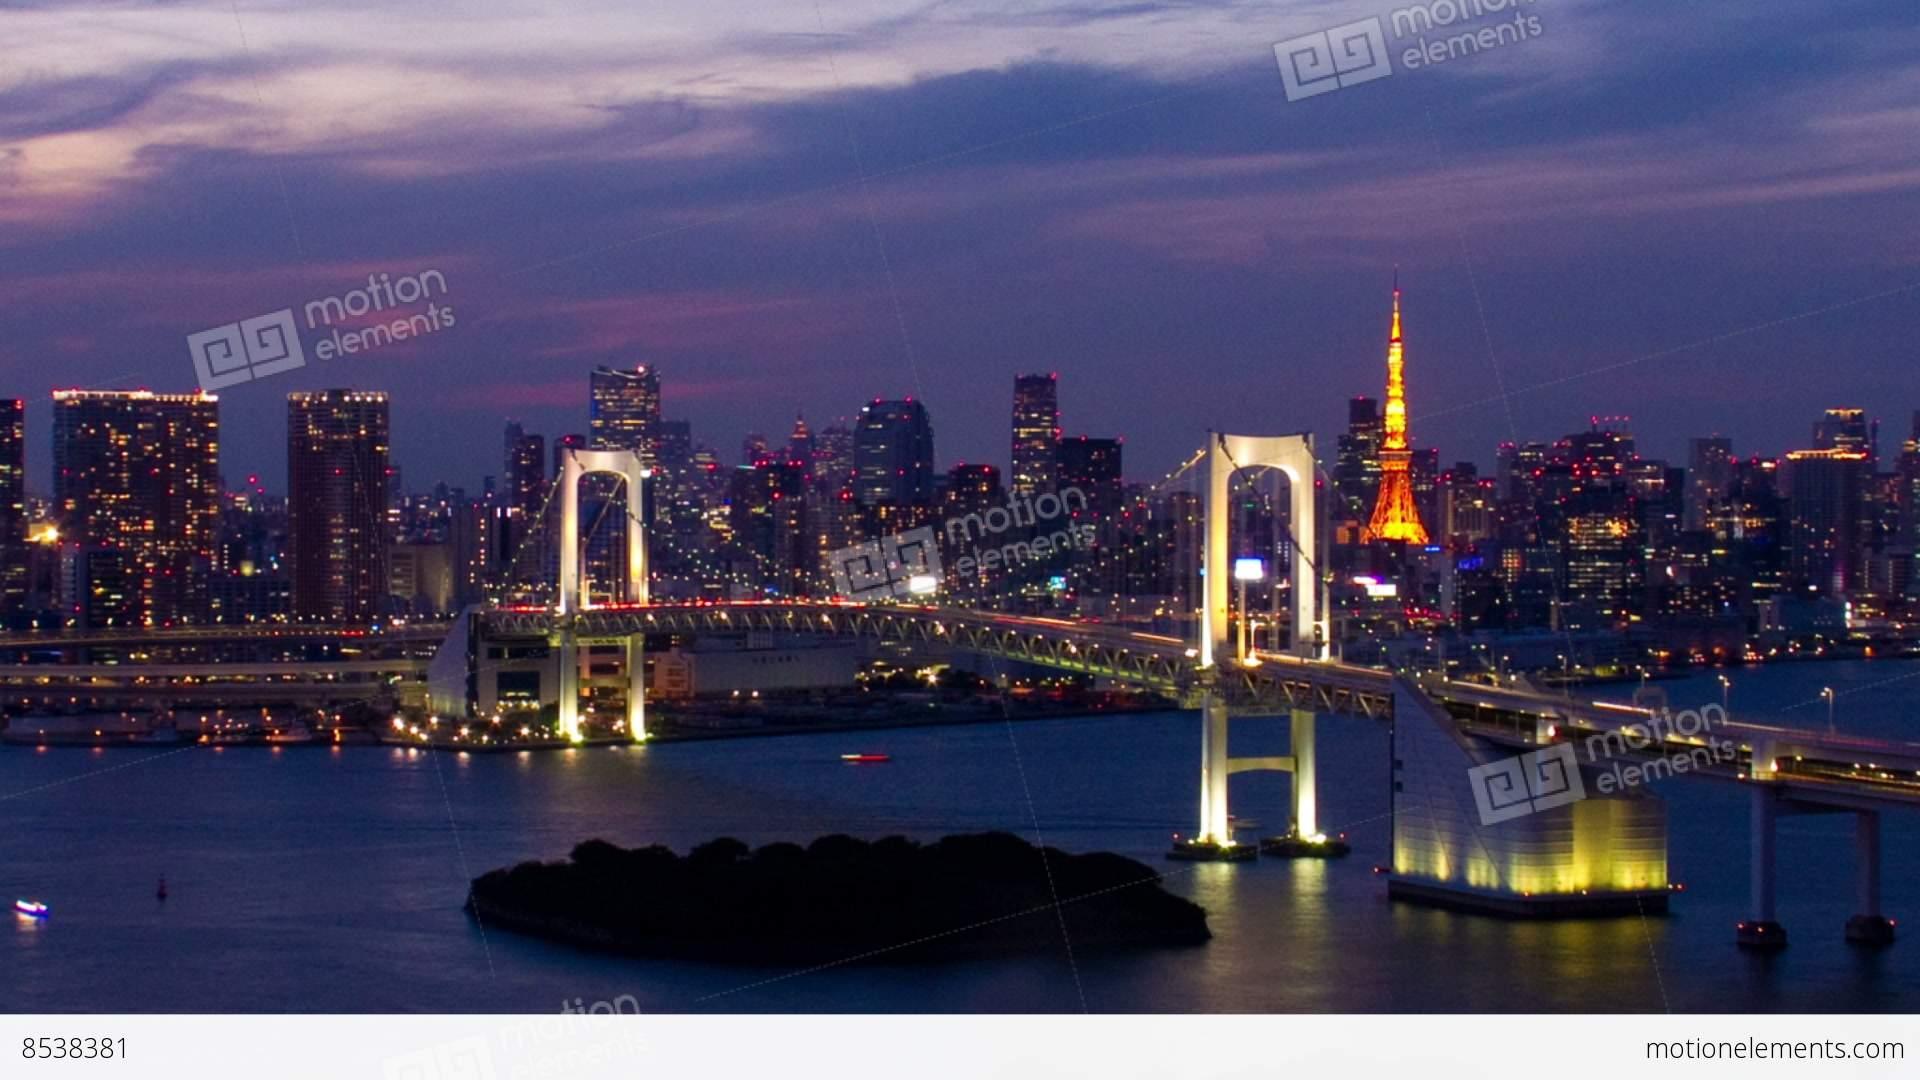 Bridge in time-lapse photo